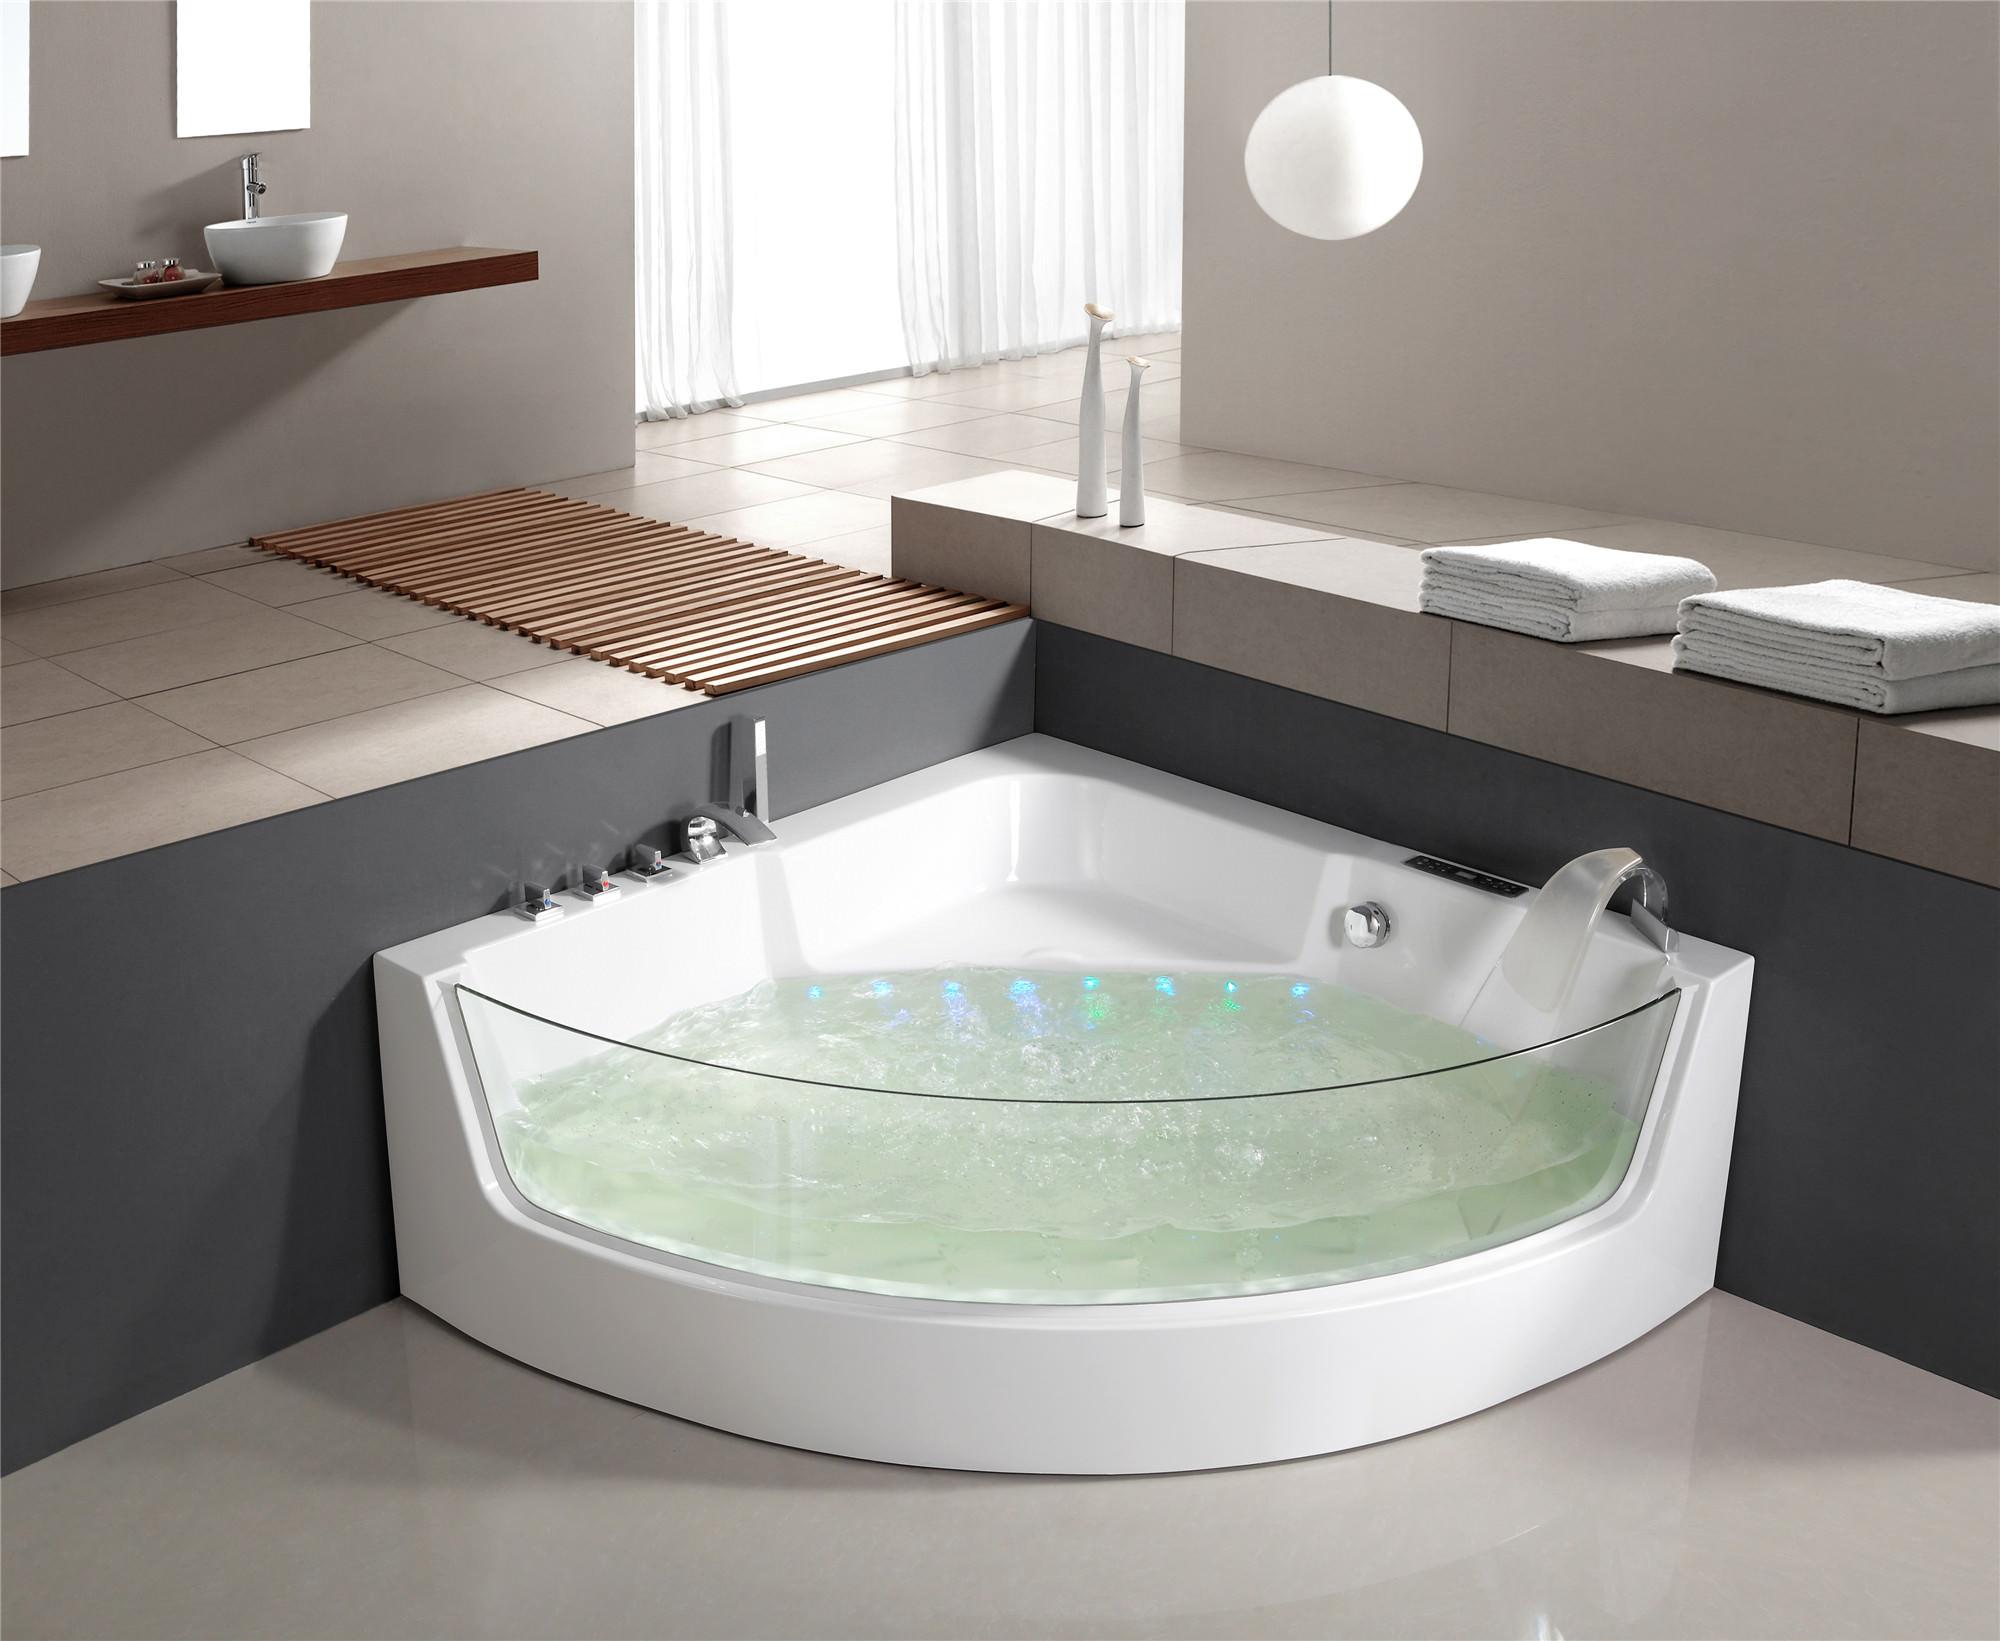 luxus whirlpool badewanne jacuzzi wanne whirlwanne pool lxw 1531 ebay. Black Bedroom Furniture Sets. Home Design Ideas